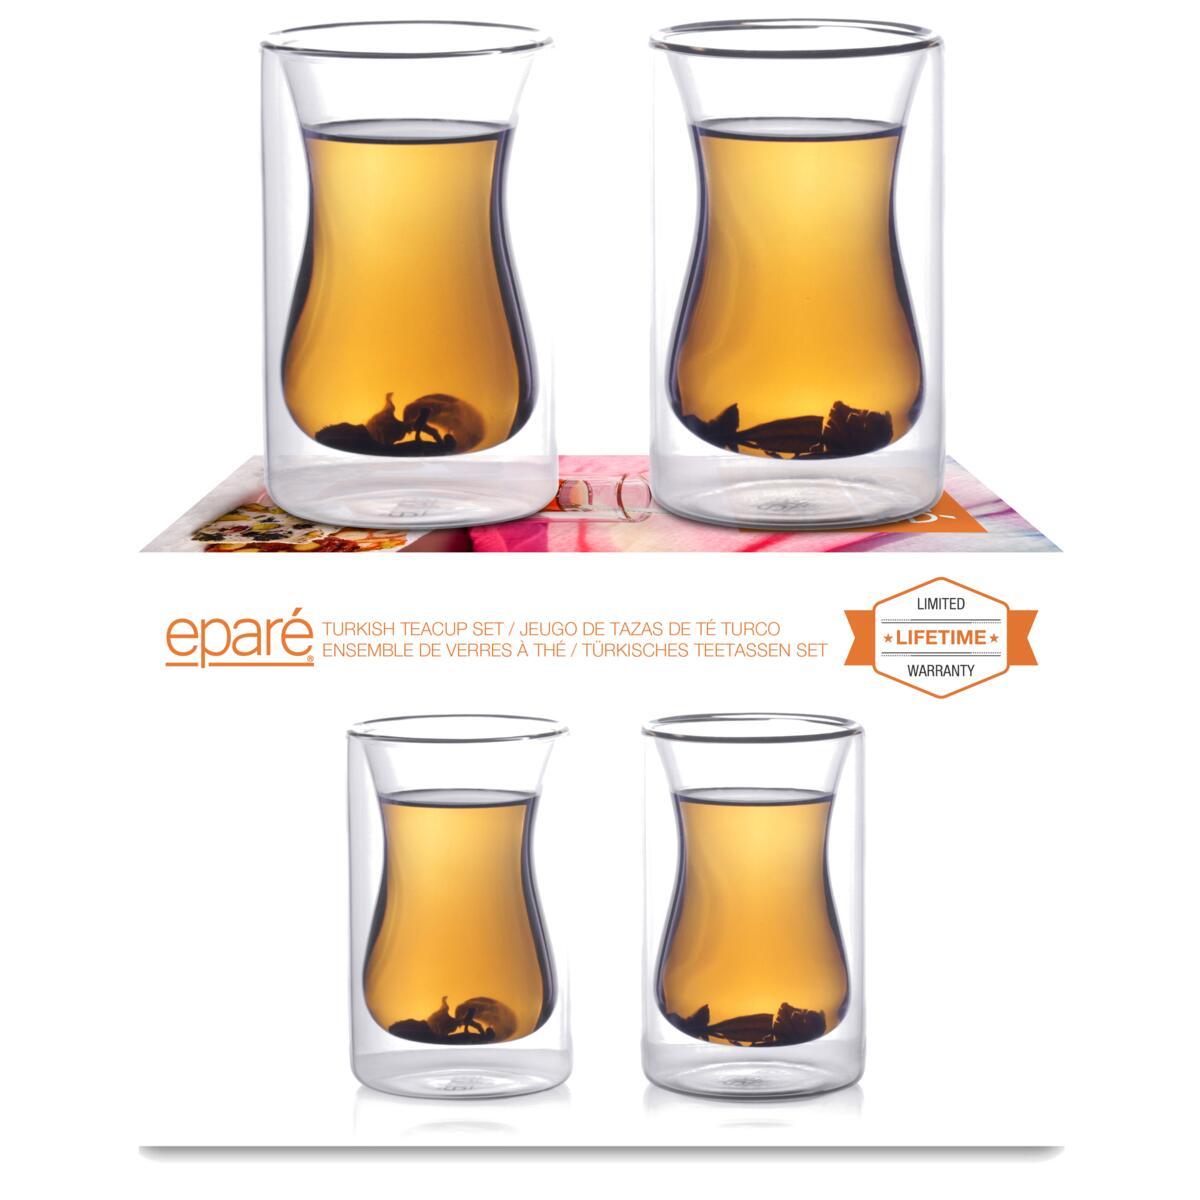 Eparé 2 oz Double Wall Espresso Cups (Set of 4) (Handle)